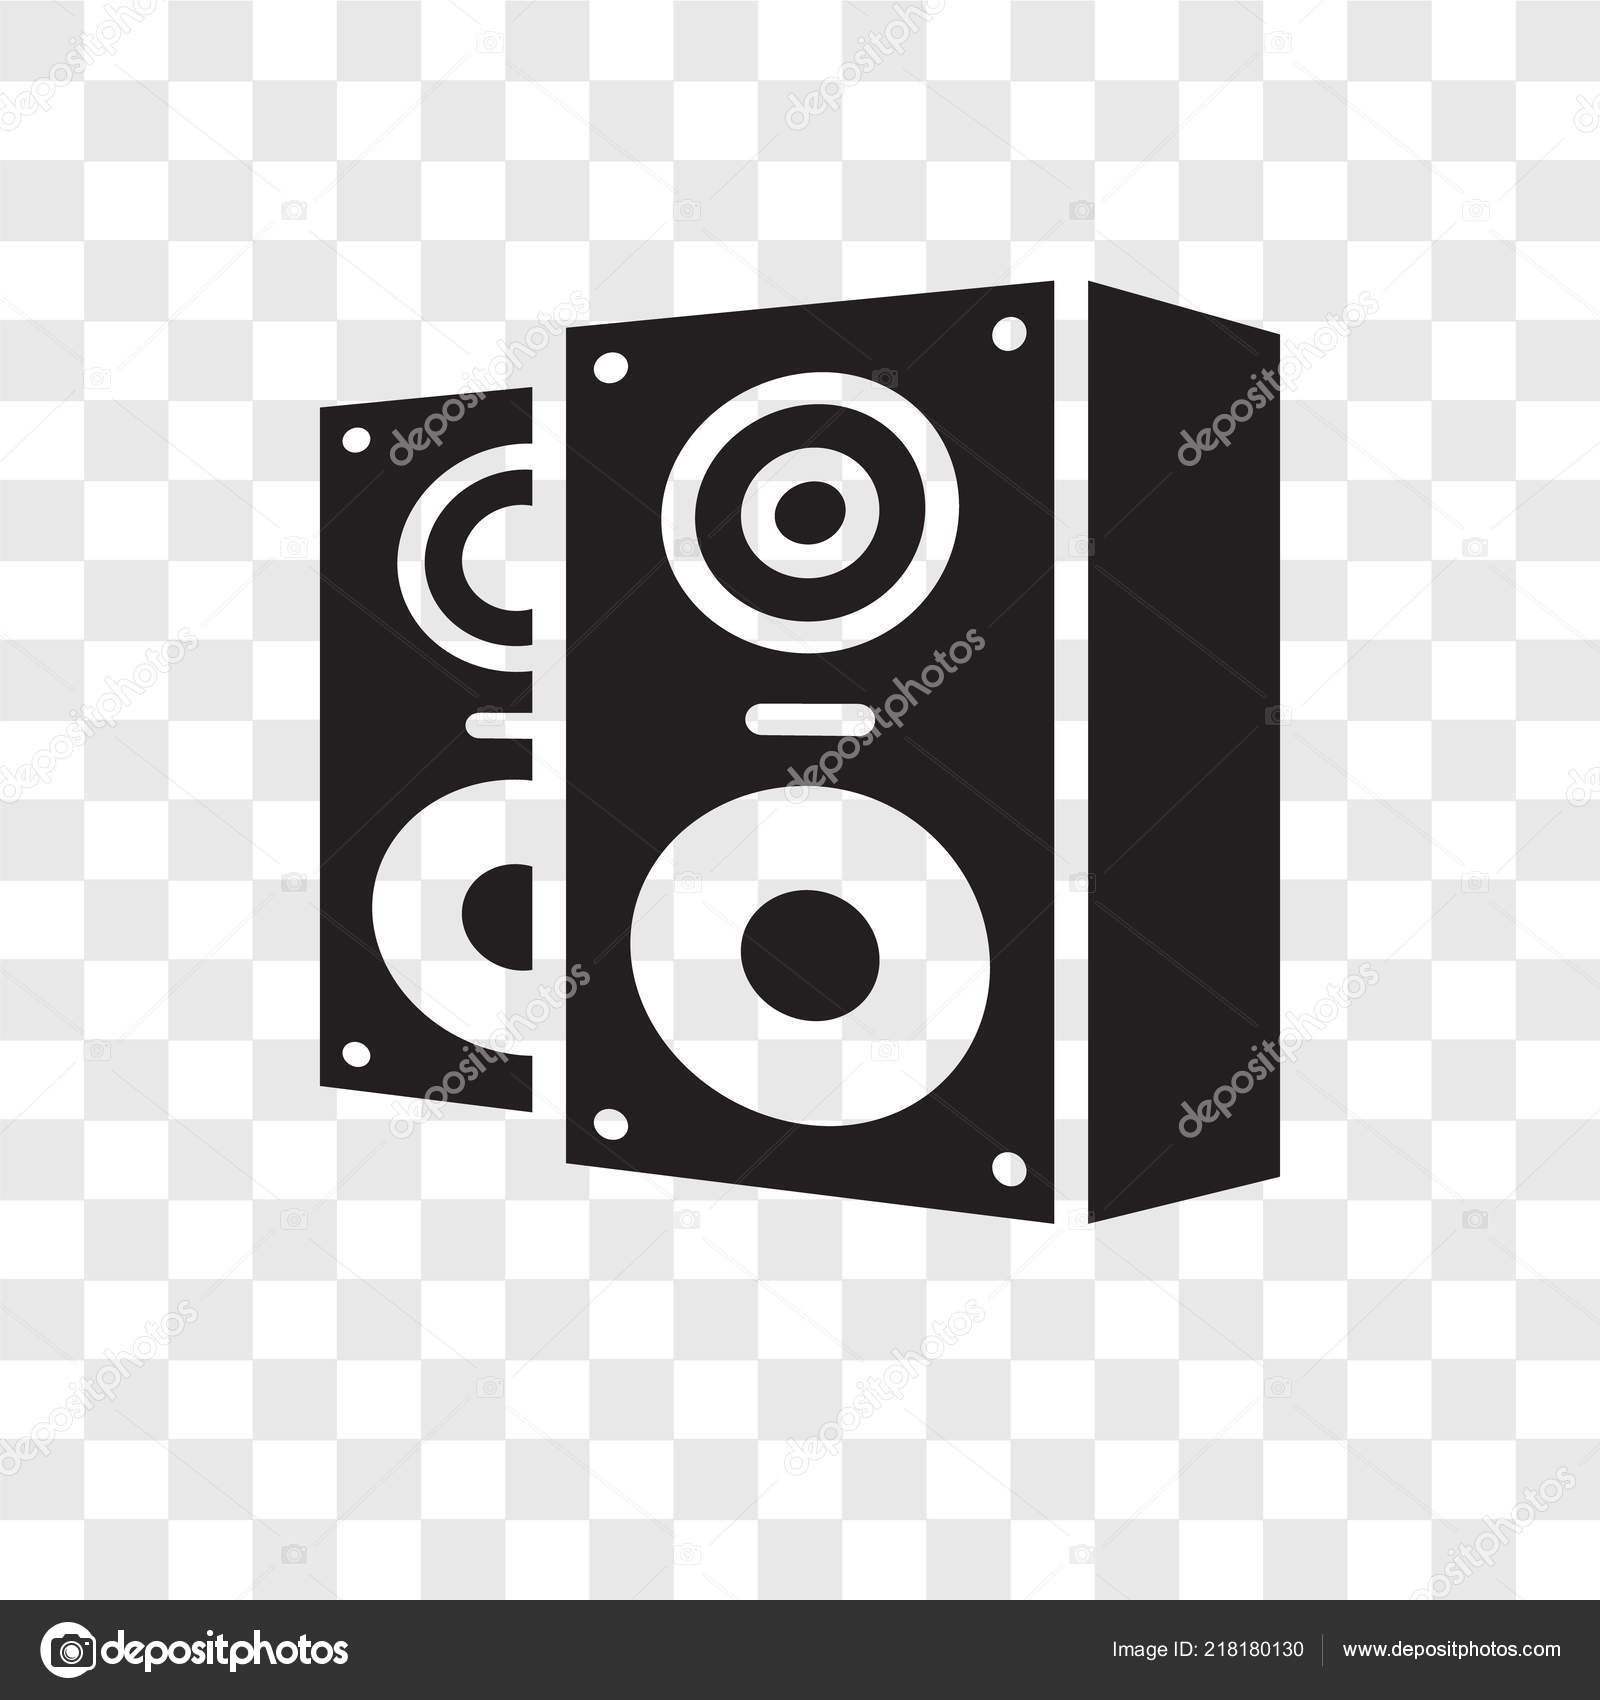 speakers icon trendy design style speakers icon isolated transparent background stock vector c topvectorstock 218180130 https depositphotos com 218180130 stock illustration speakers vector icon isolated transparent html